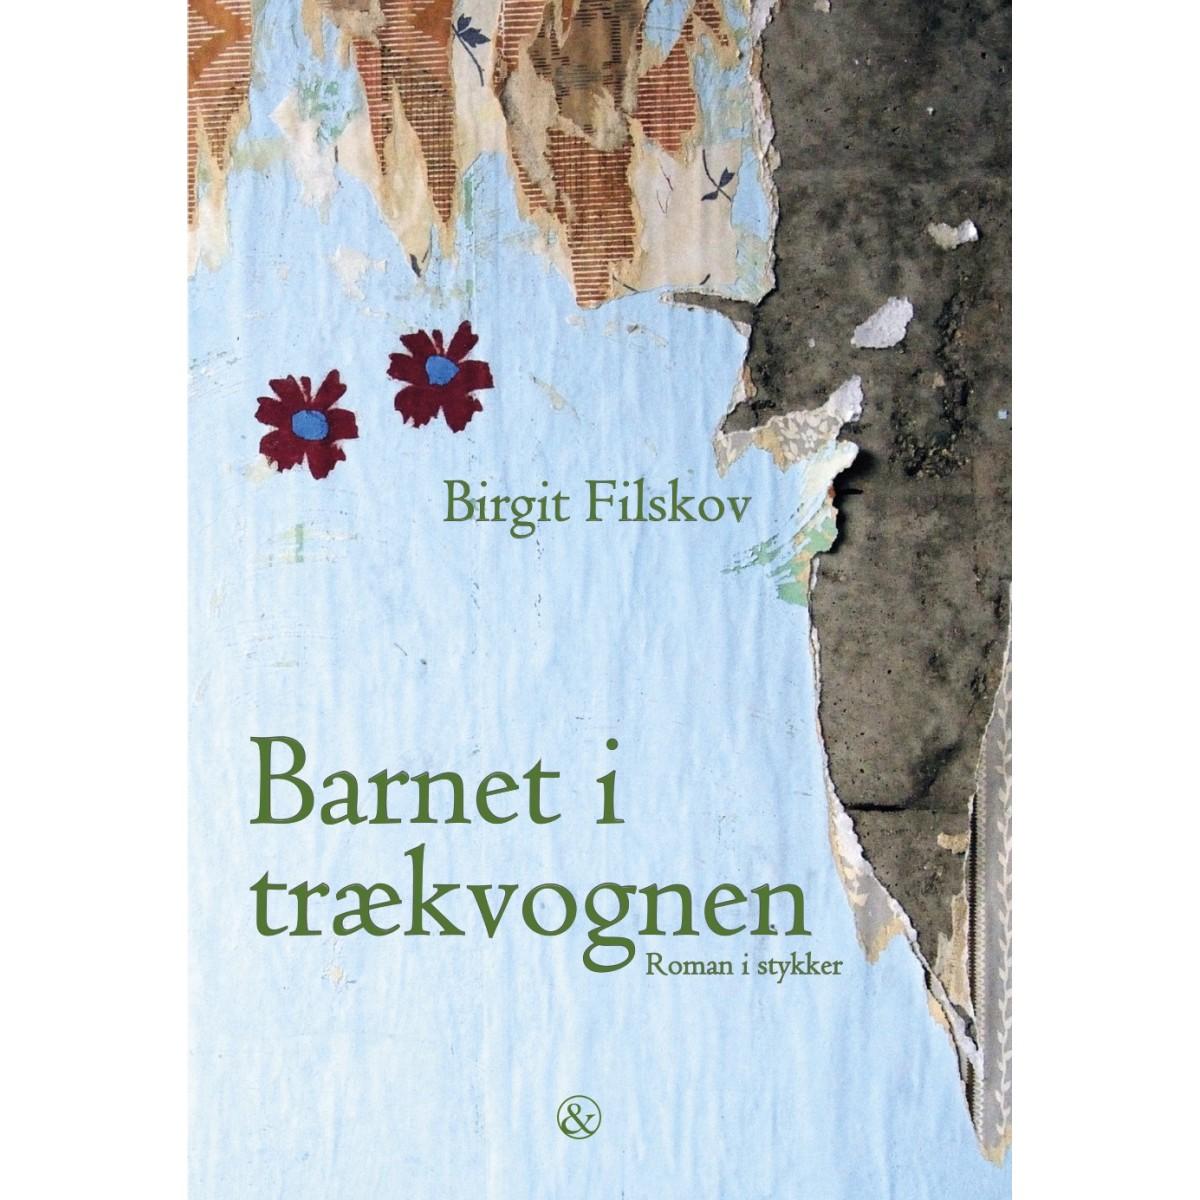 Birgit Filskov: Barnet i trækvognen